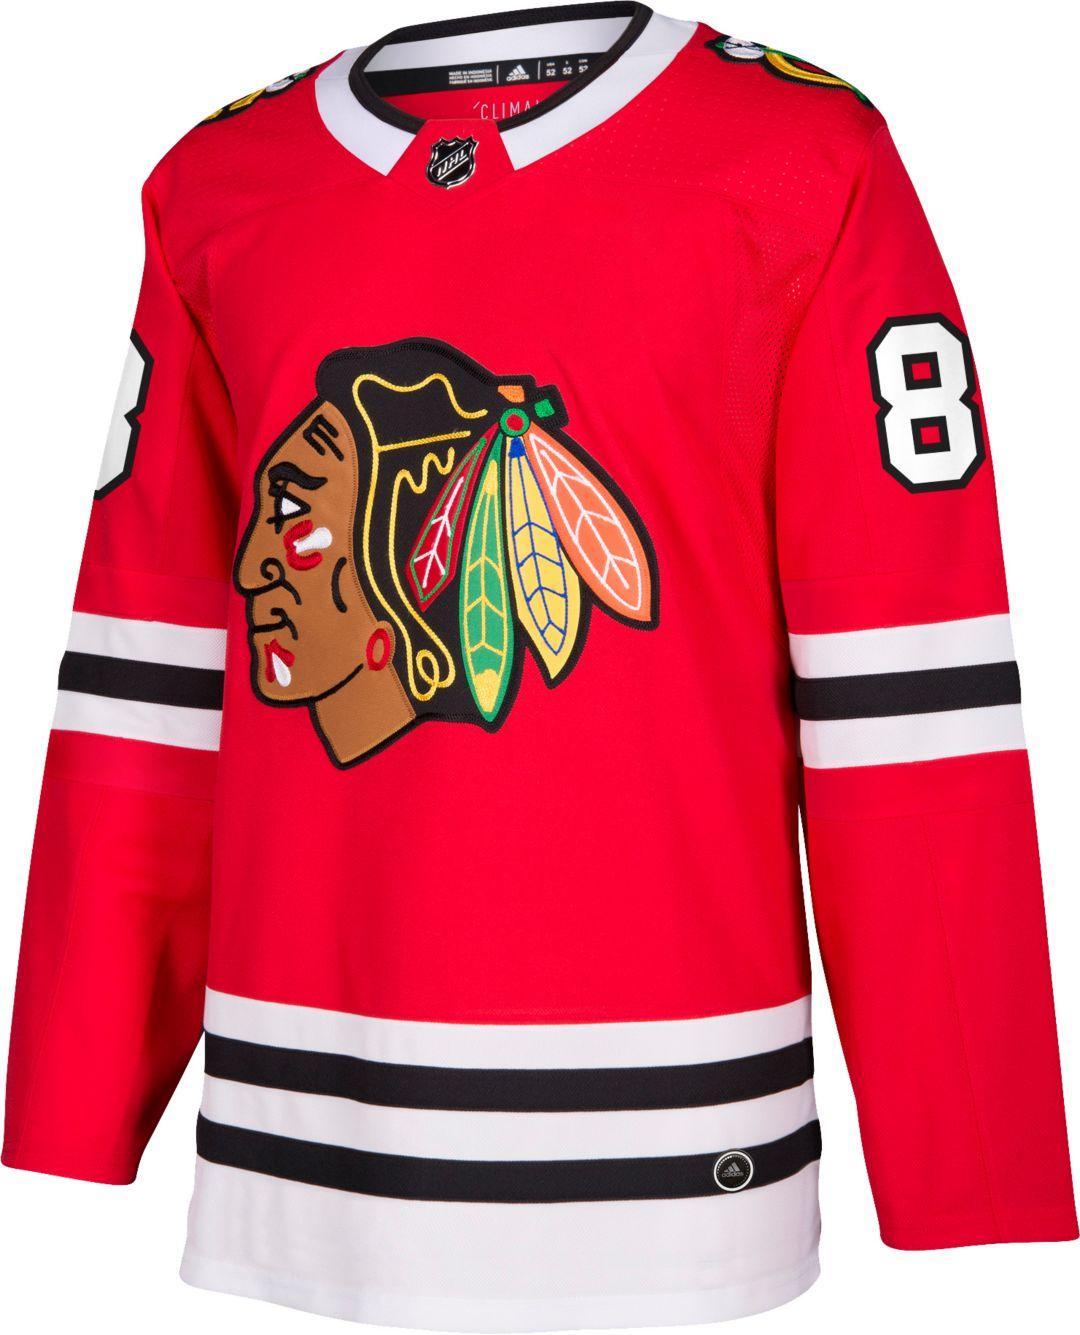 meet e40c4 cc5bf adidas Men's Chicago Blackhawks Patrick Kane #88 Authentic Pro Home Jersey